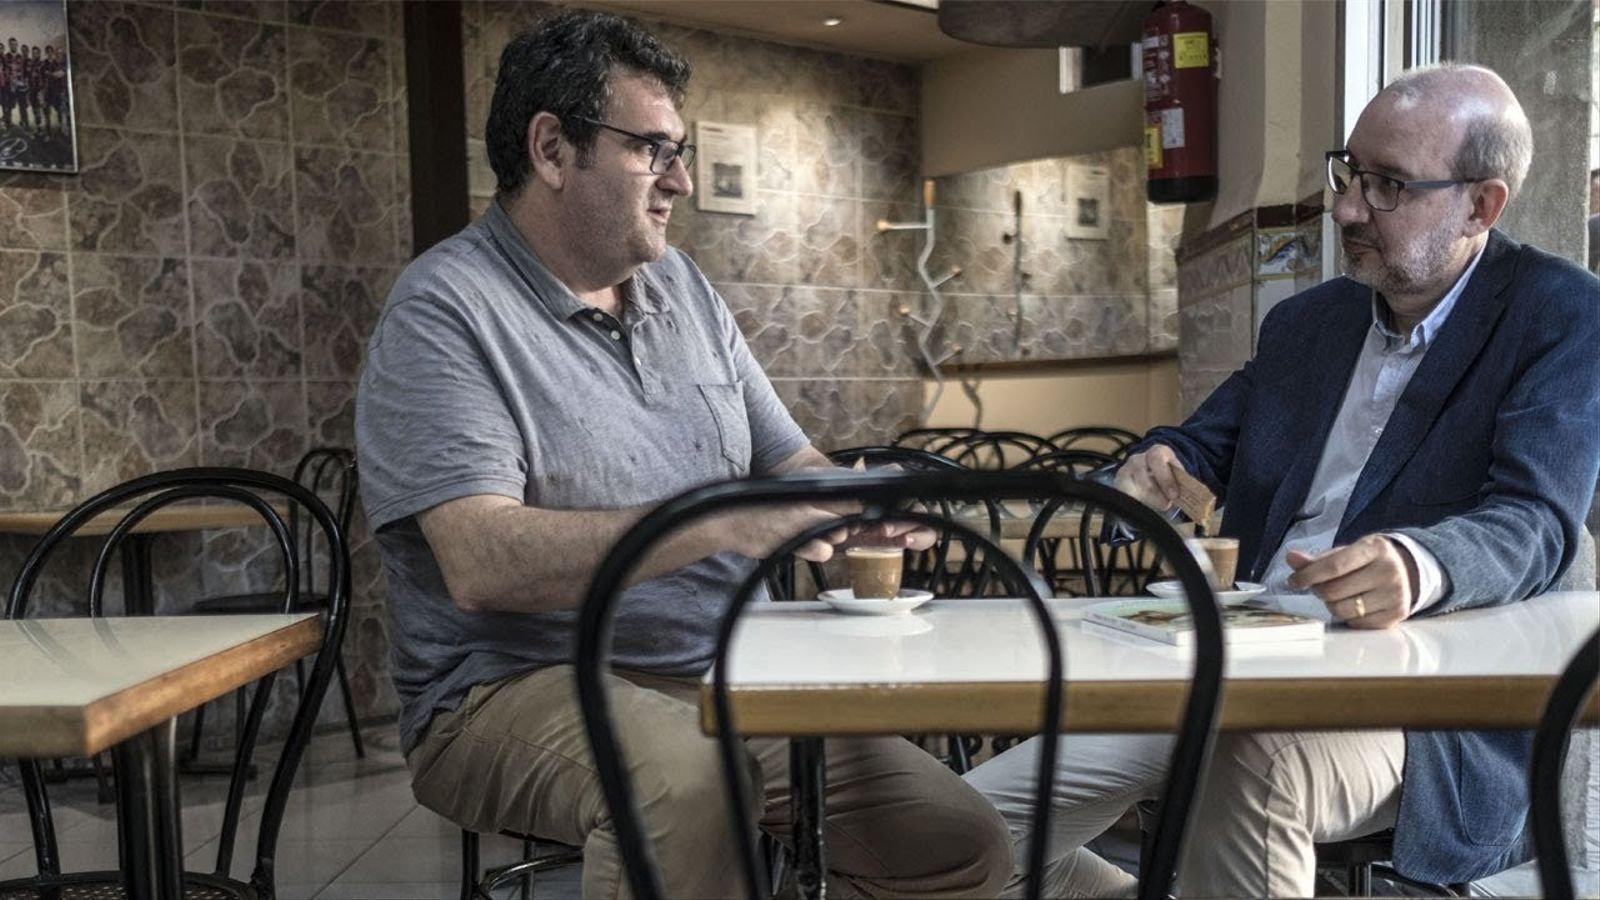 Entrevista d'Antoni Bassas a Jordi Puntí